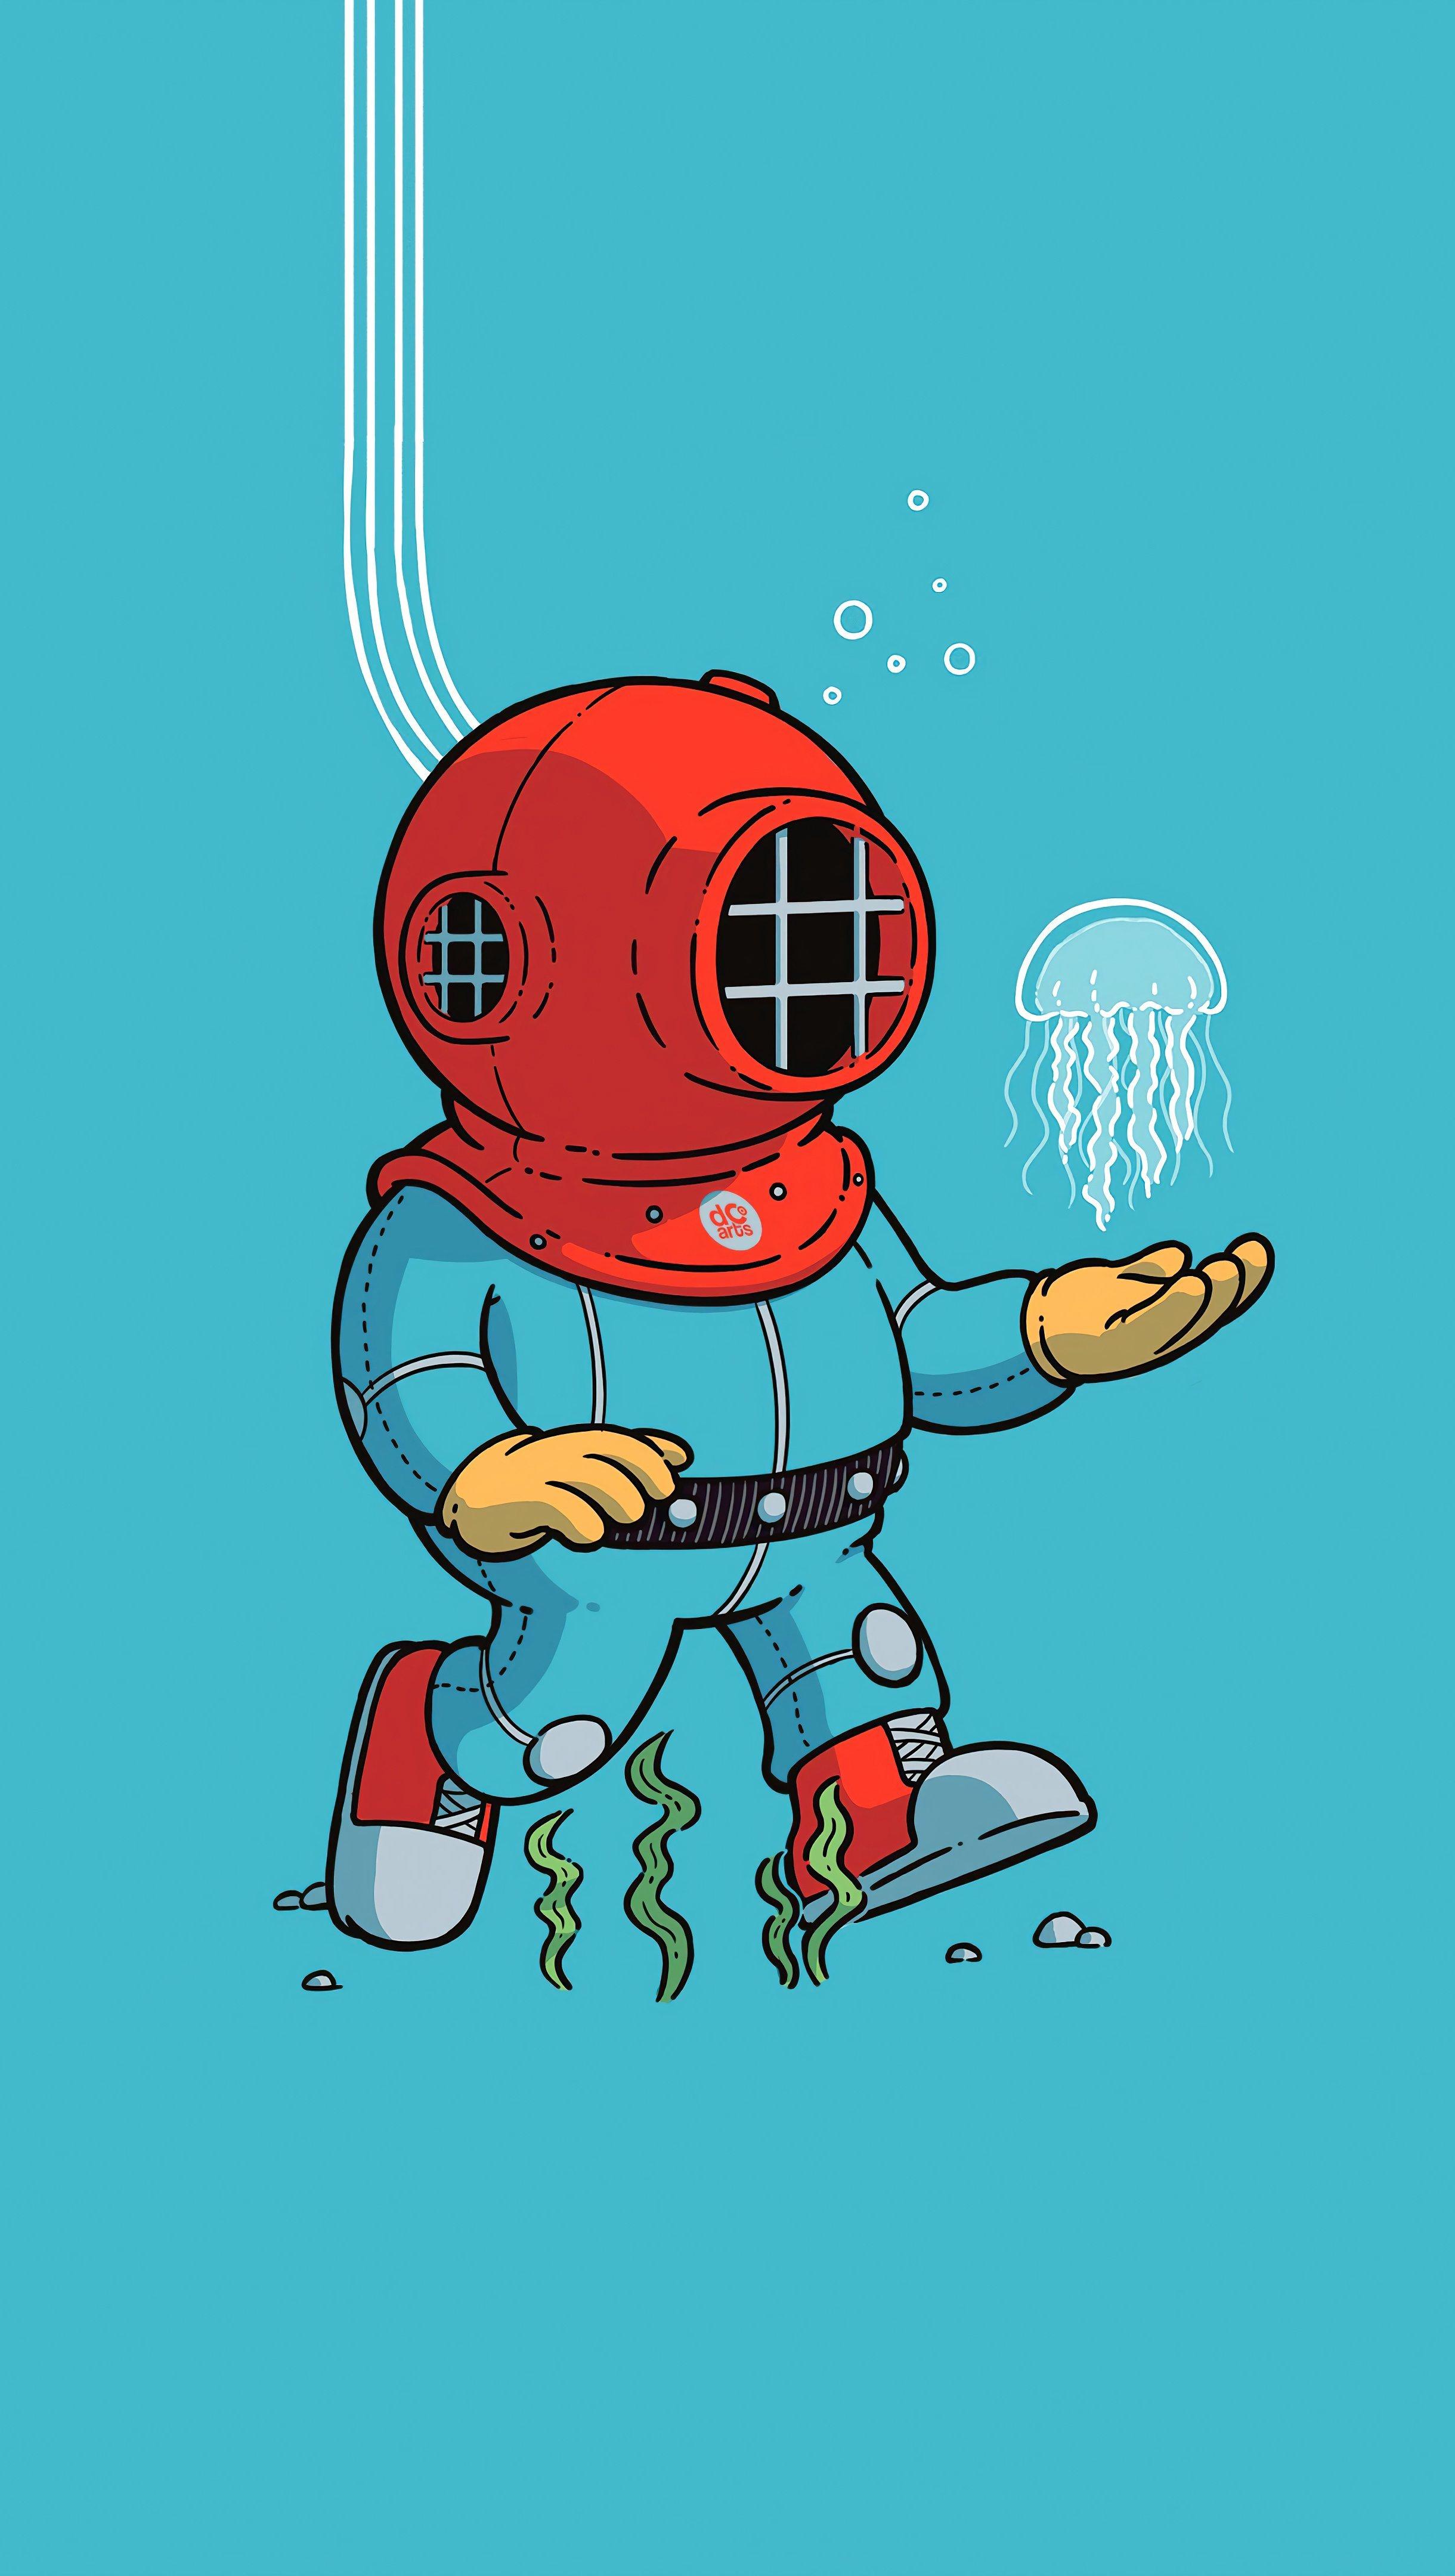 Wallpaper Diving suit Minimalist Illustration Vertical